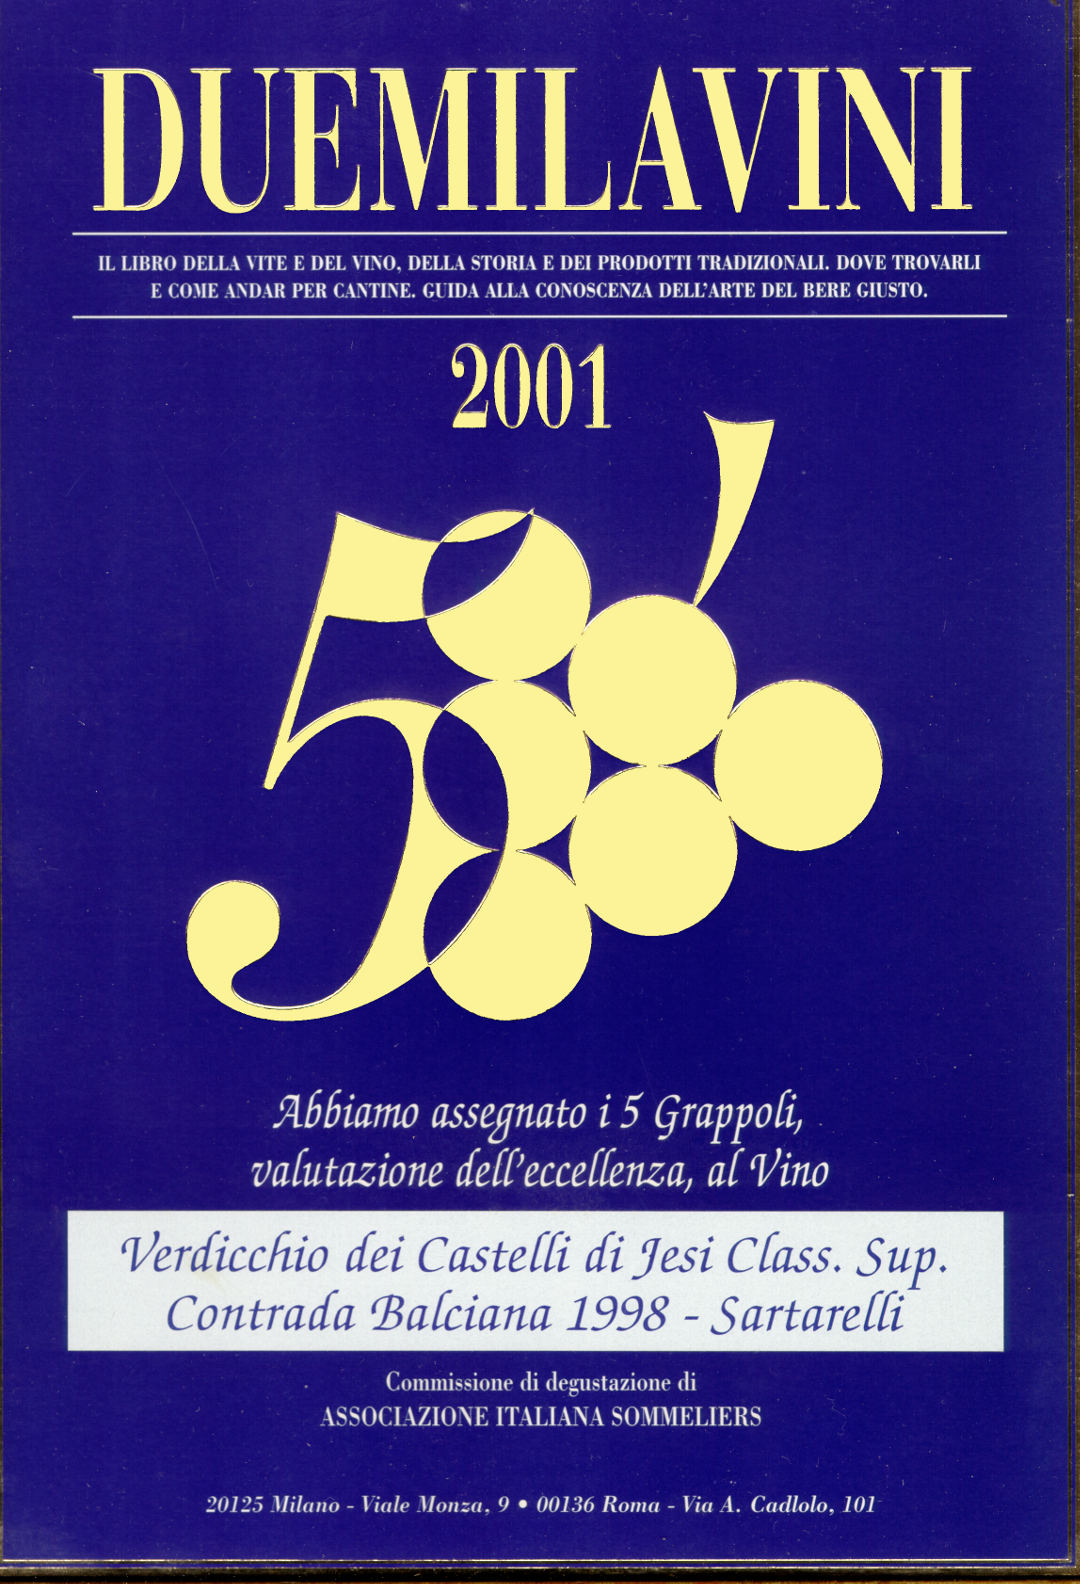 Balciana Sartarelli 1998 - 5 Grappoli 2001